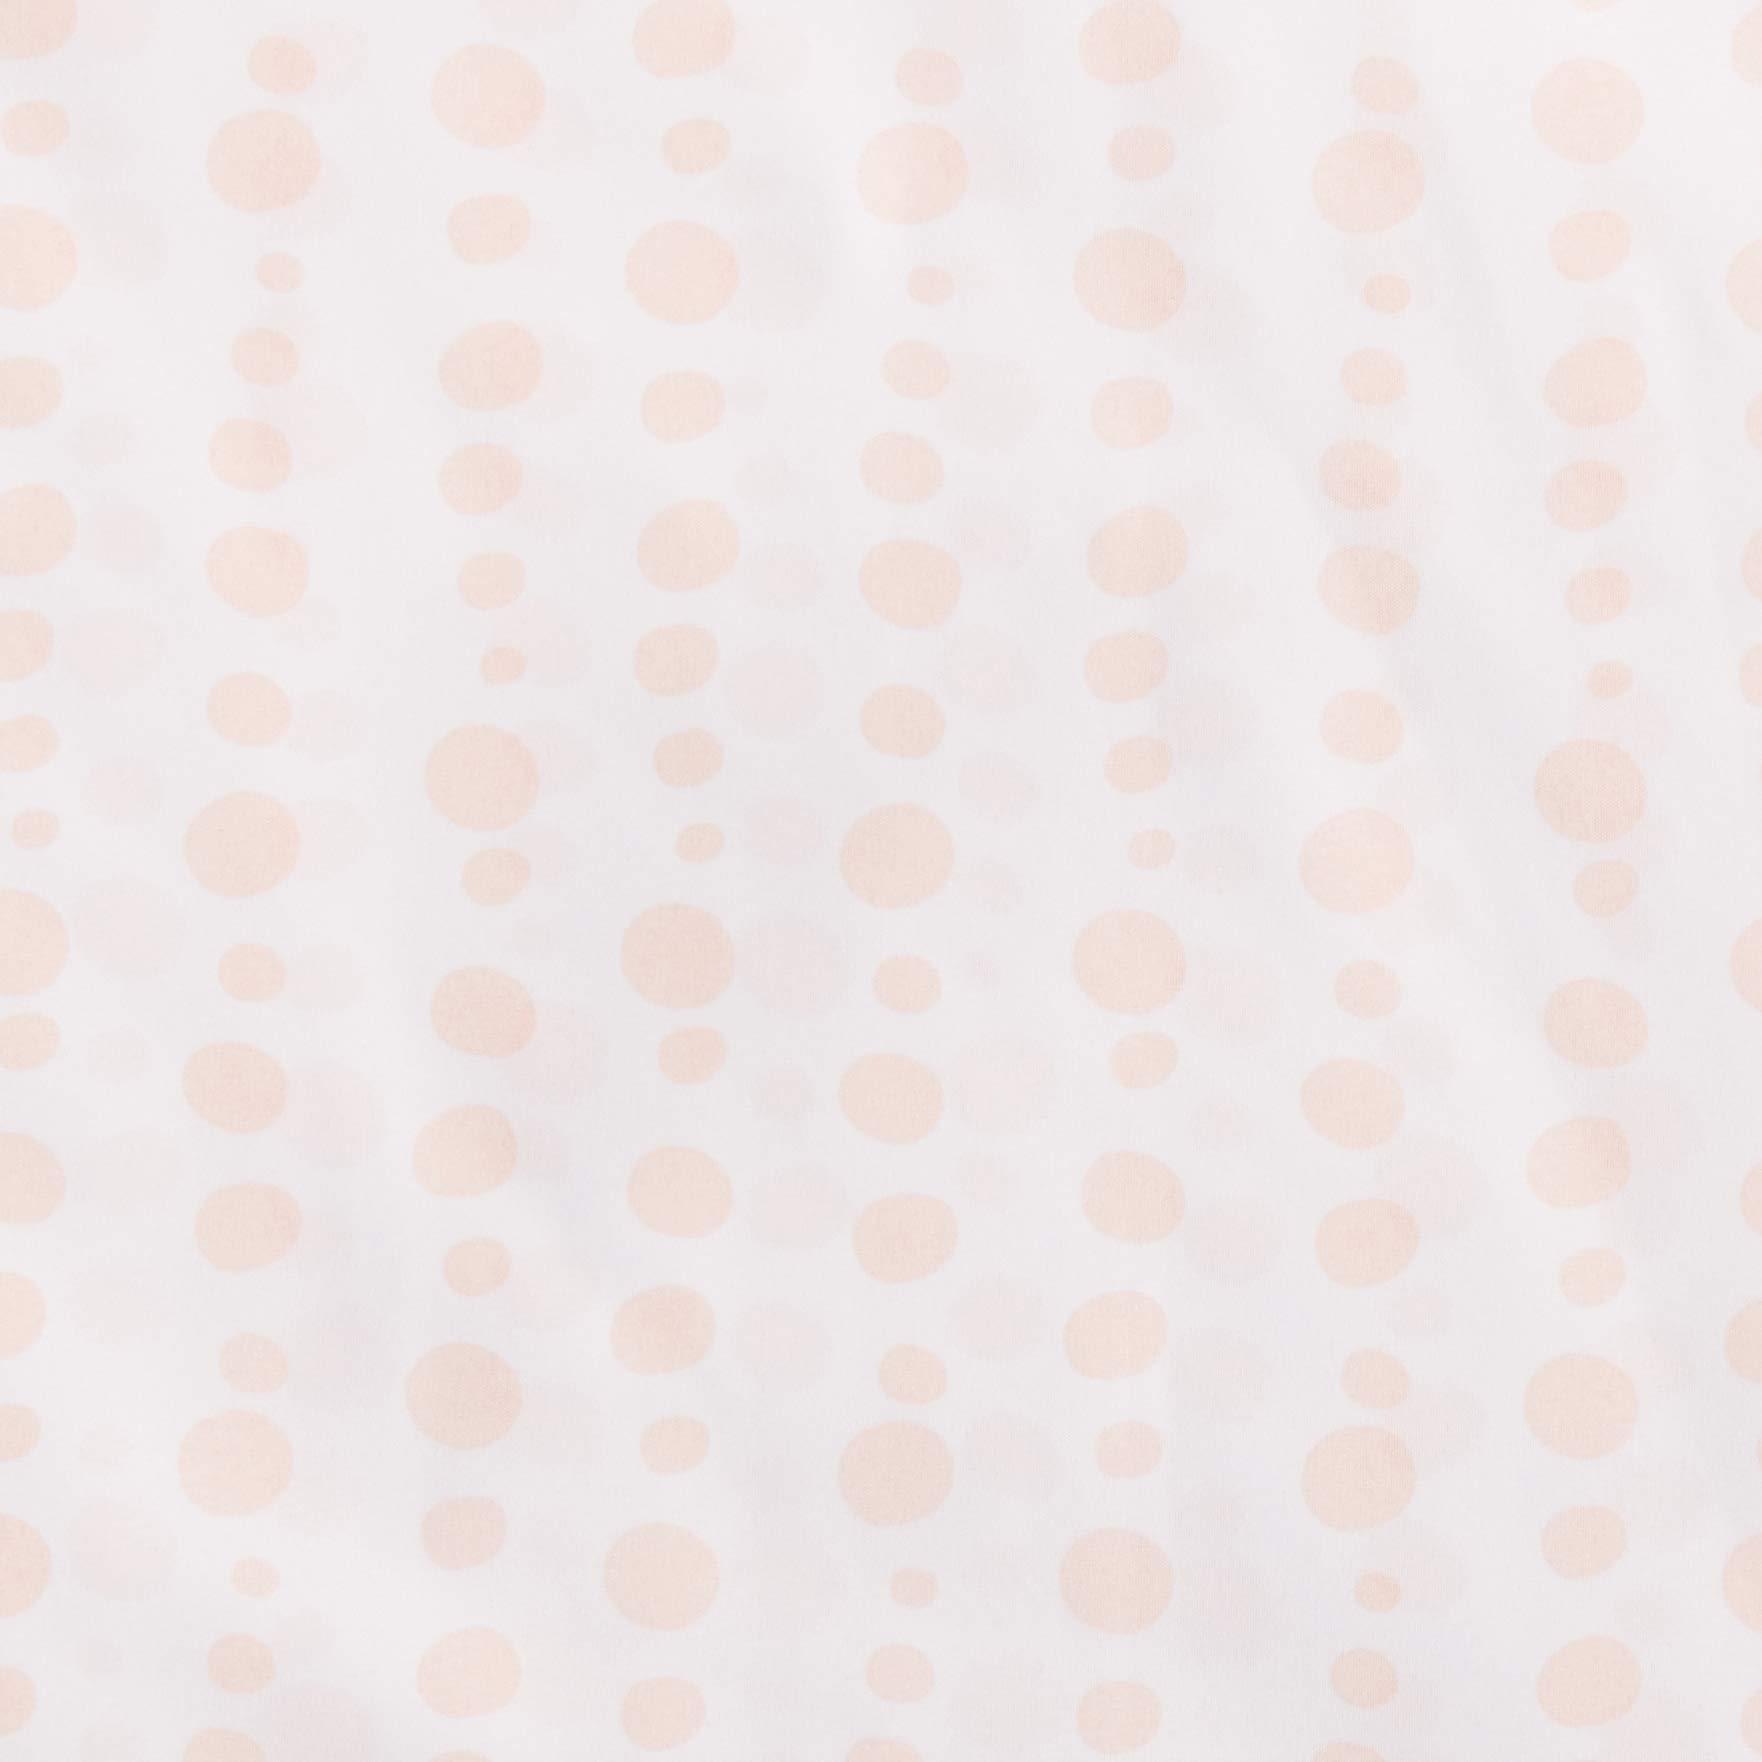 AmazonBasics Kid's Sheet Set - Soft, Easy-Wash Microfiber - Twin, Pink Dotted Stripes by AmazonBasics (Image #2)